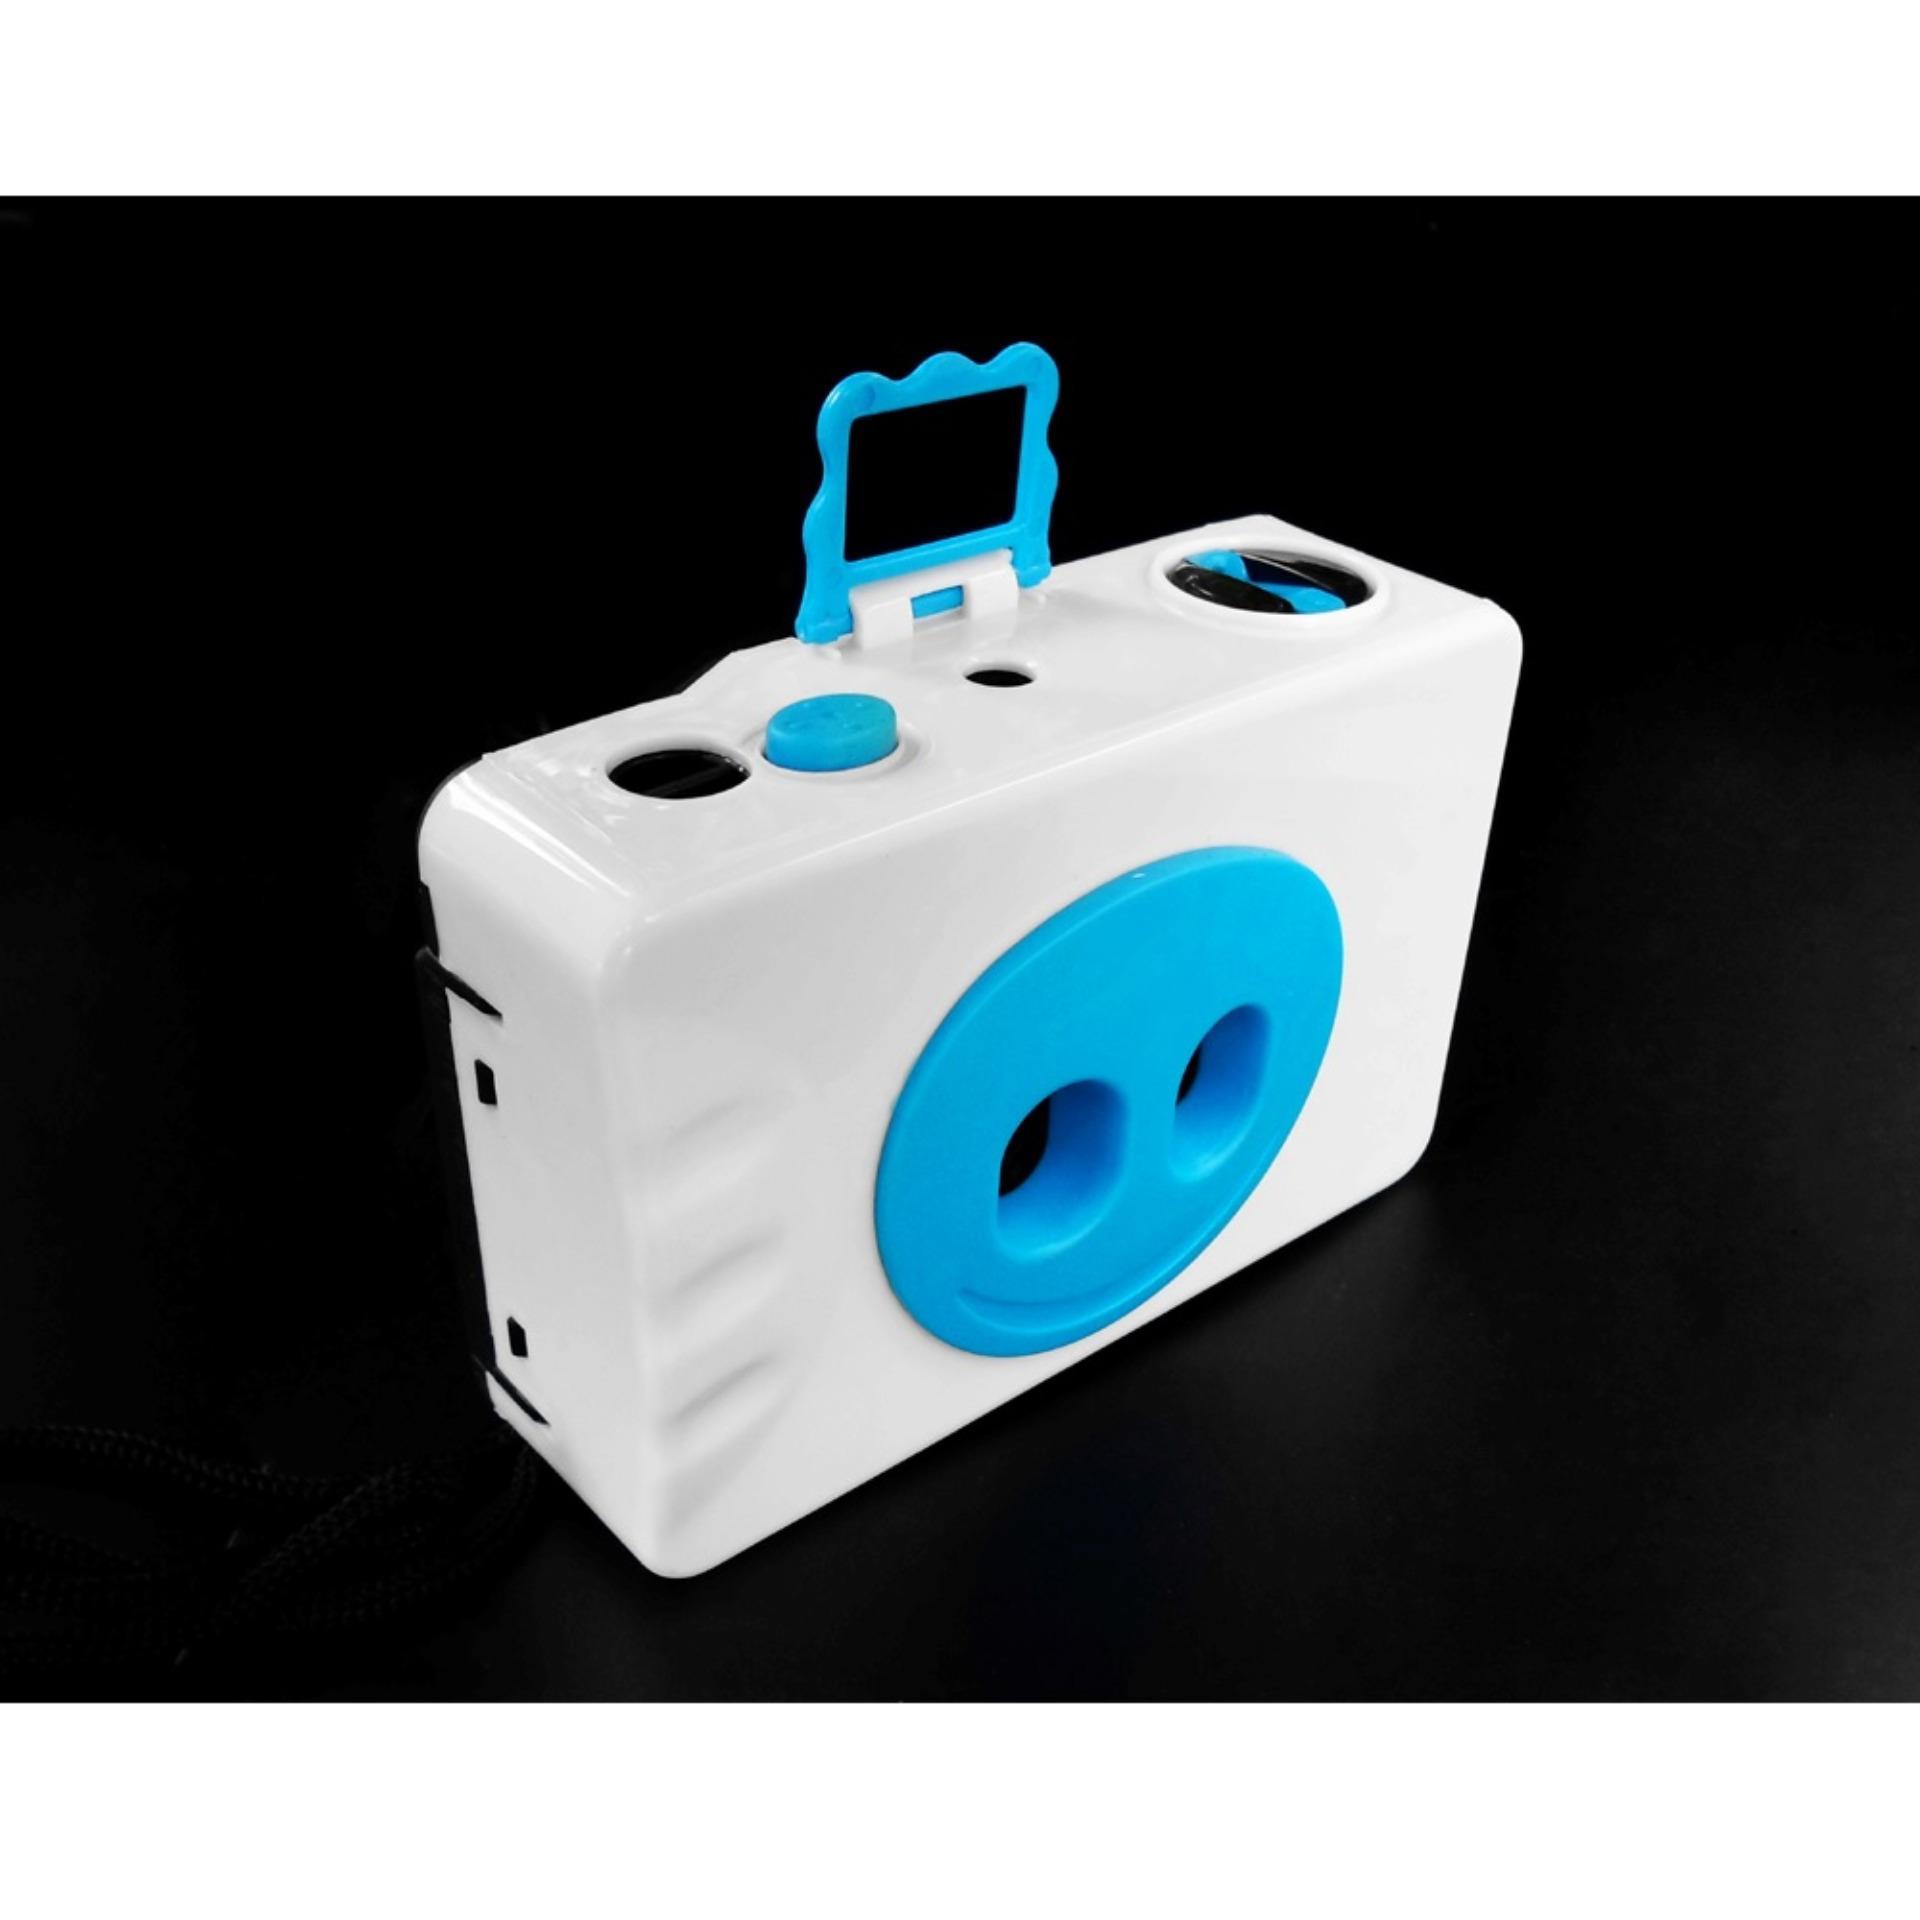 LOMO 35mm Multi Lens Action Camera 2 Lens - Putih/Biru